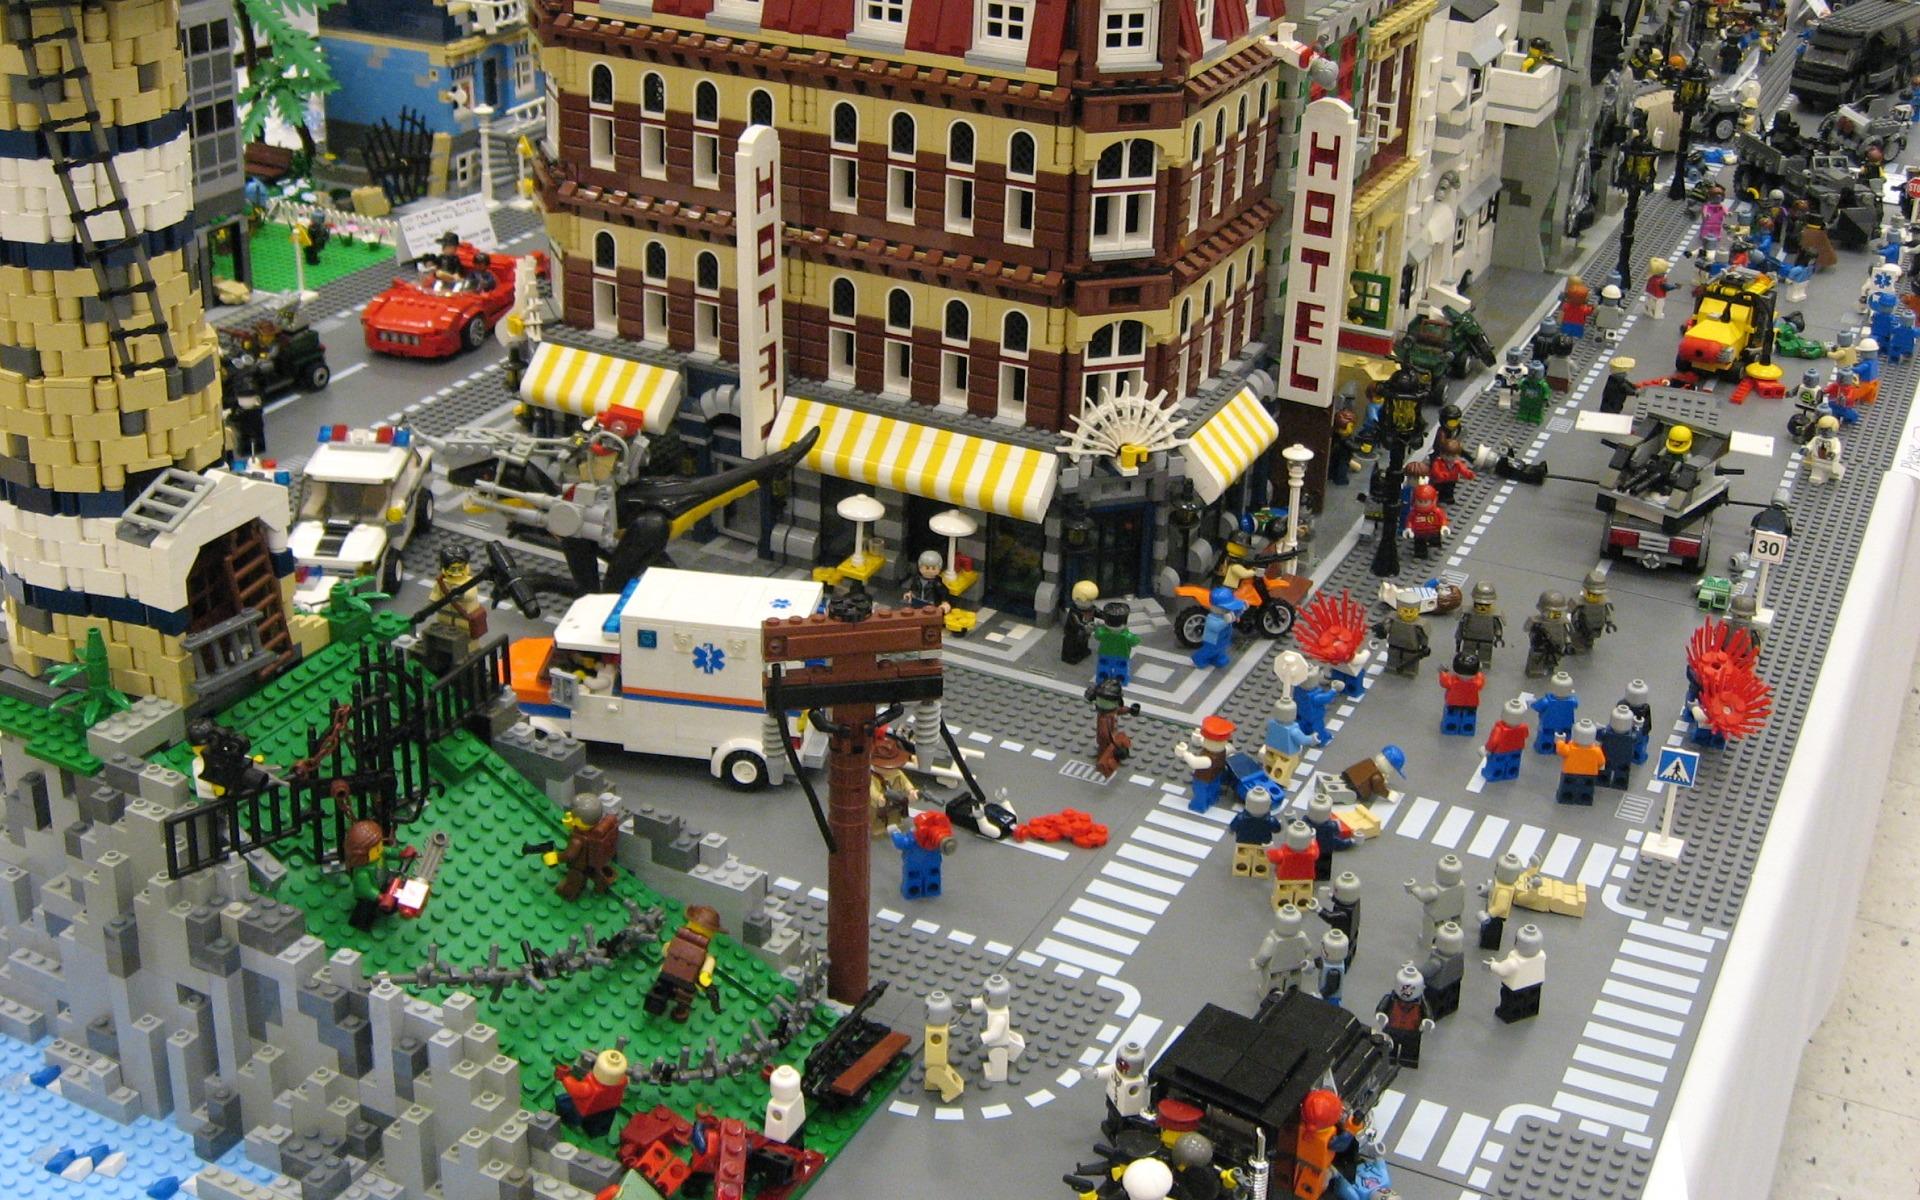 47+] LEGO City Wallpaper on WallpaperSafari